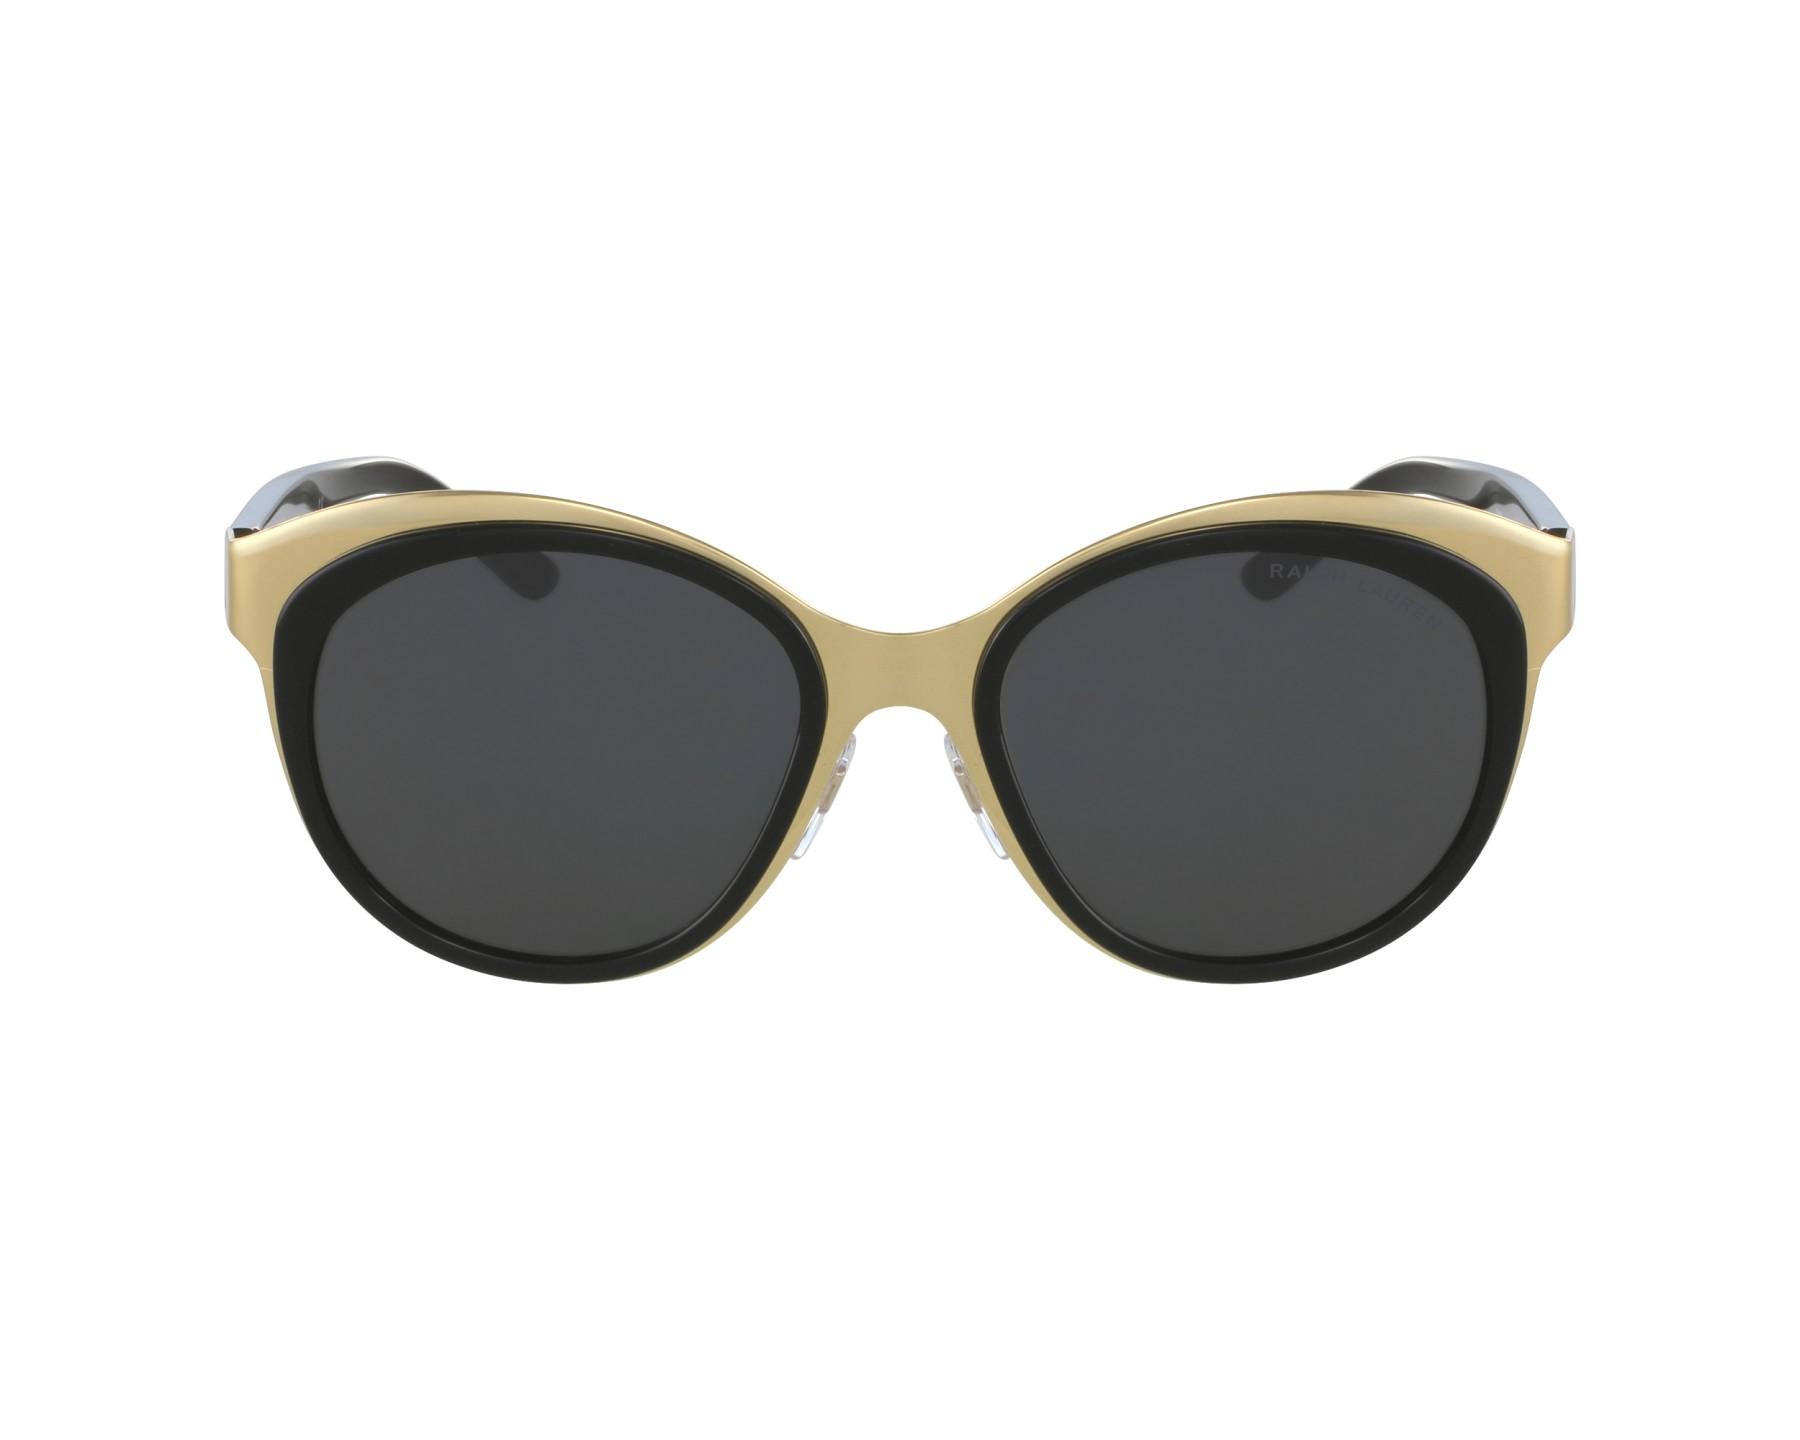 lunettes de soleil ralph lauren rl 7051 9004 87 or avec des verres gris. Black Bedroom Furniture Sets. Home Design Ideas